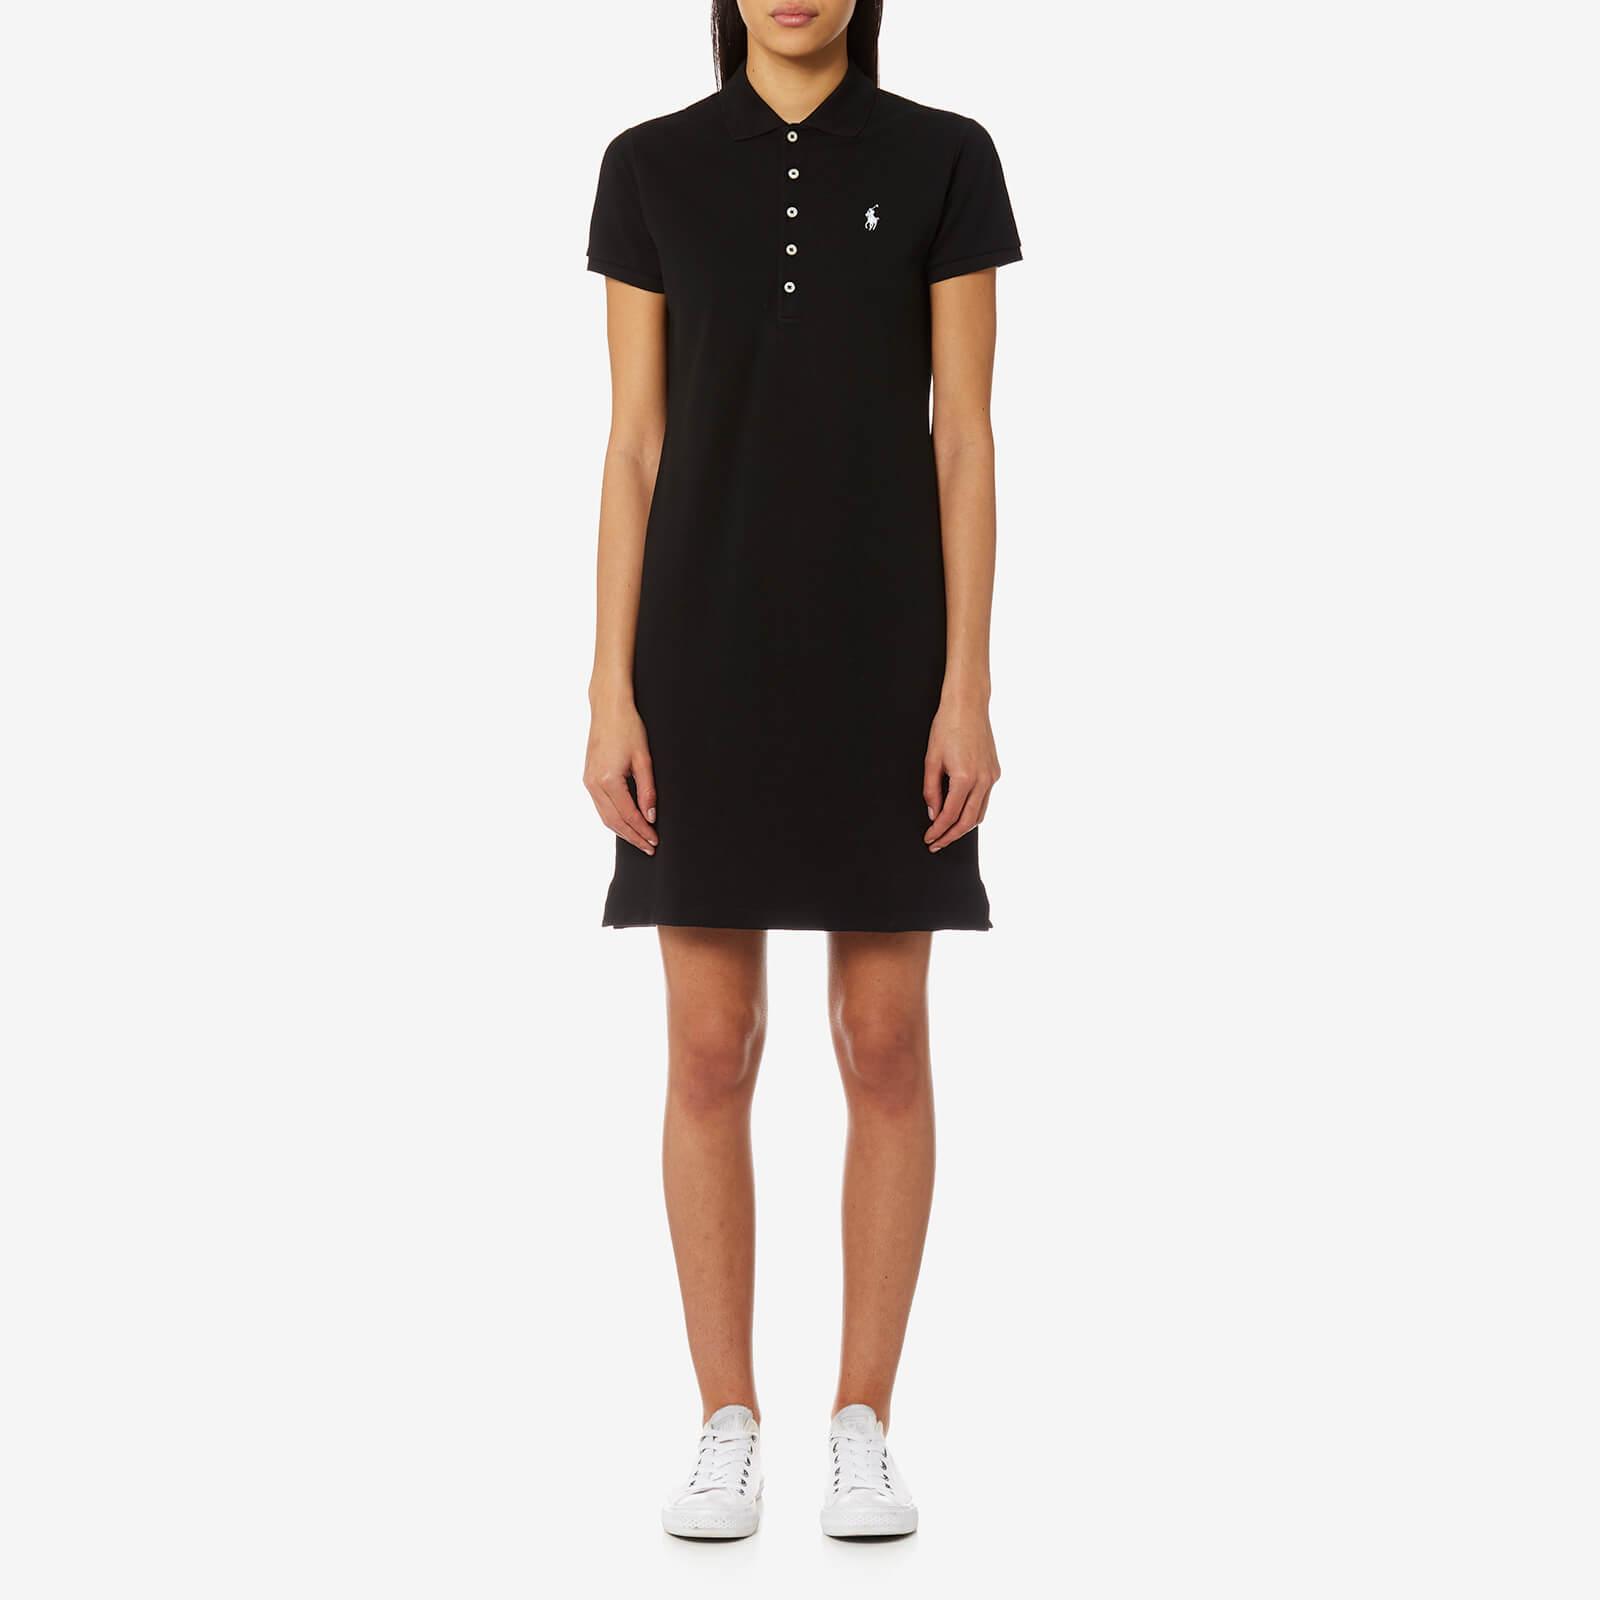 5c51152d Polo Ralph Lauren Women's Stretch Mesh Polo Dress - Black